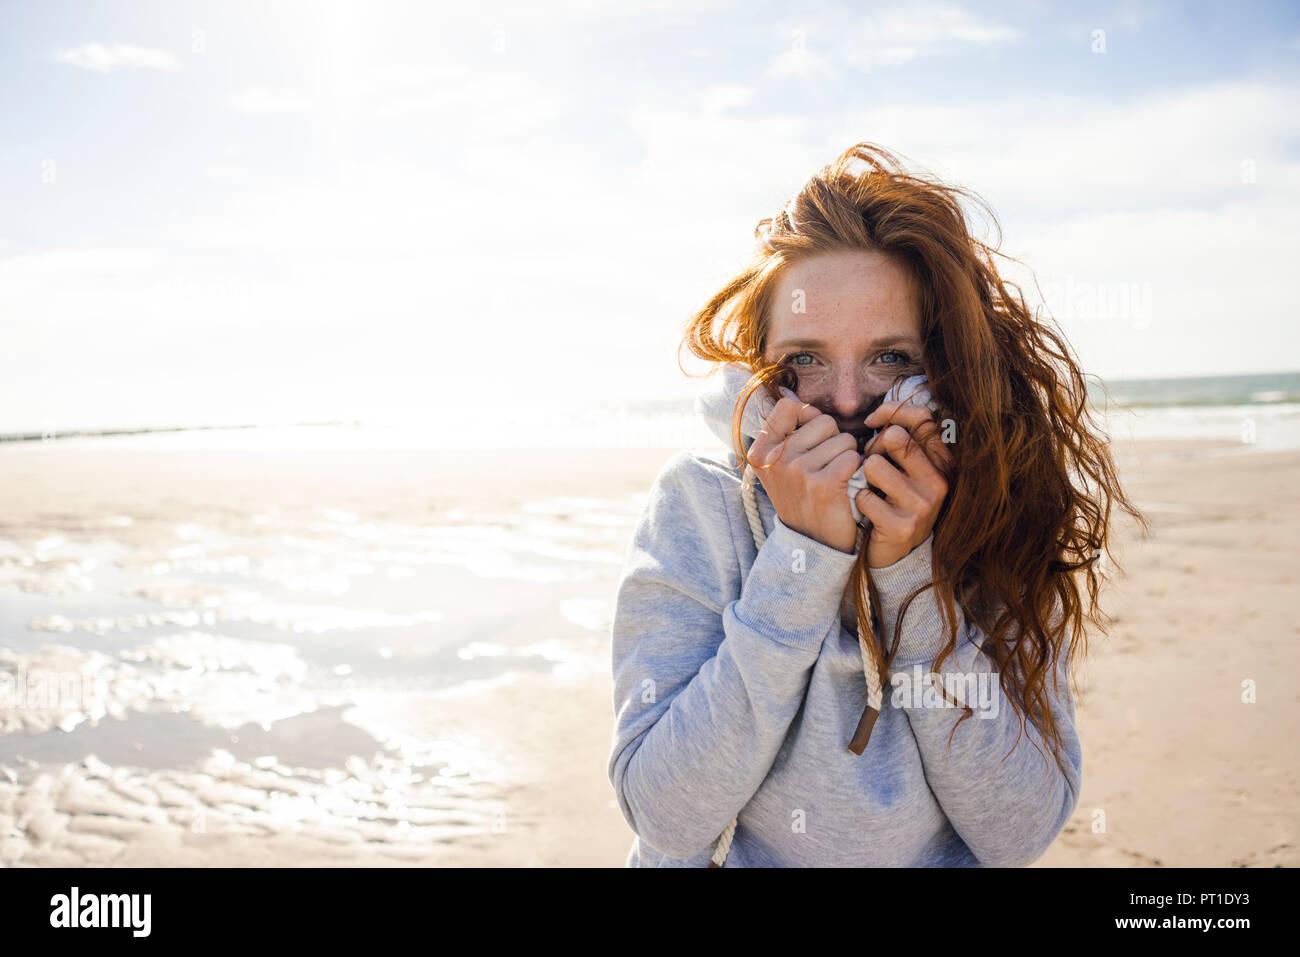 Redheaded woman enjoying fresh air at the beach - Stock Image